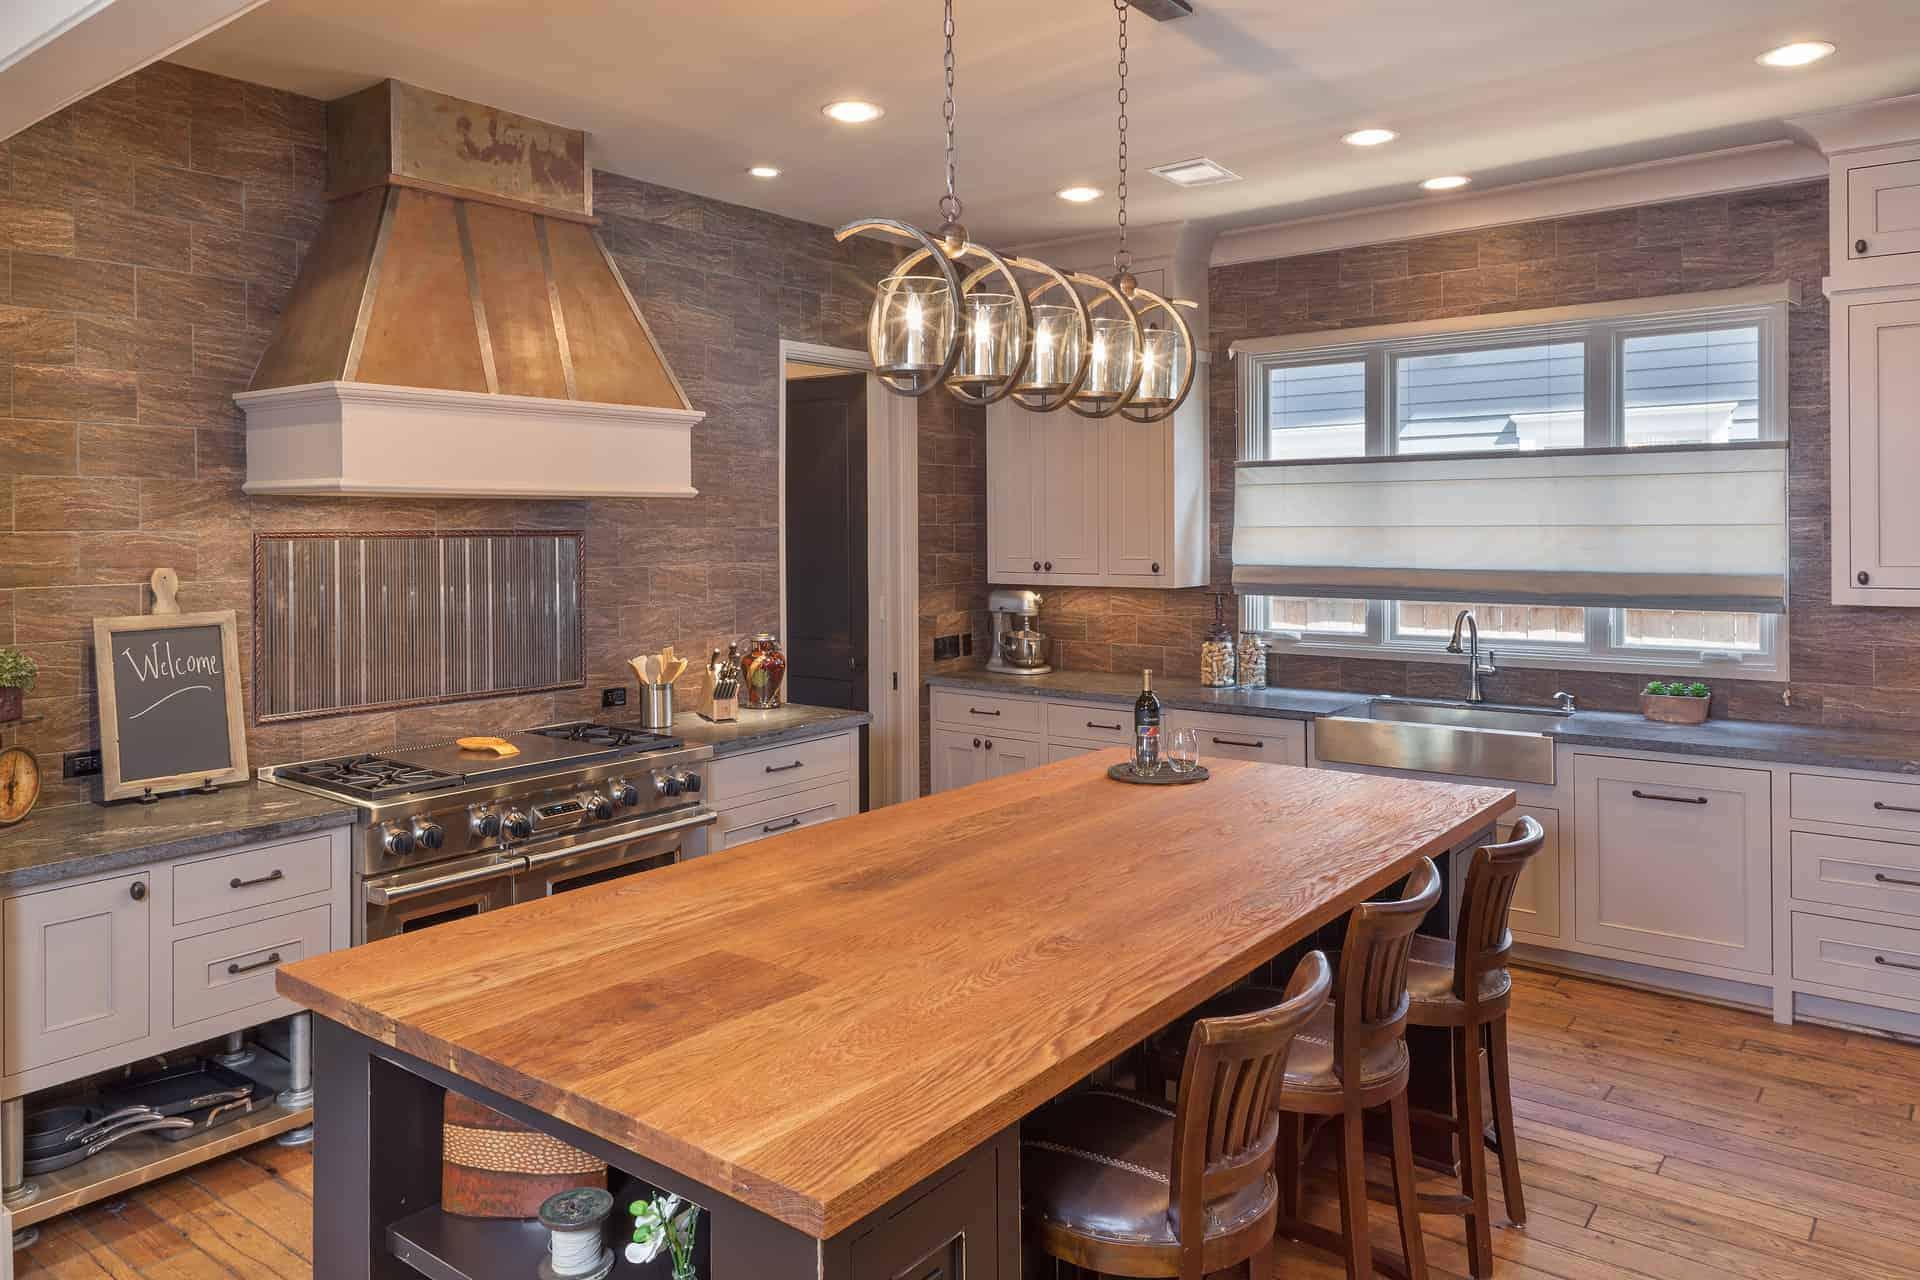 1305ashland-transitional-kitchen